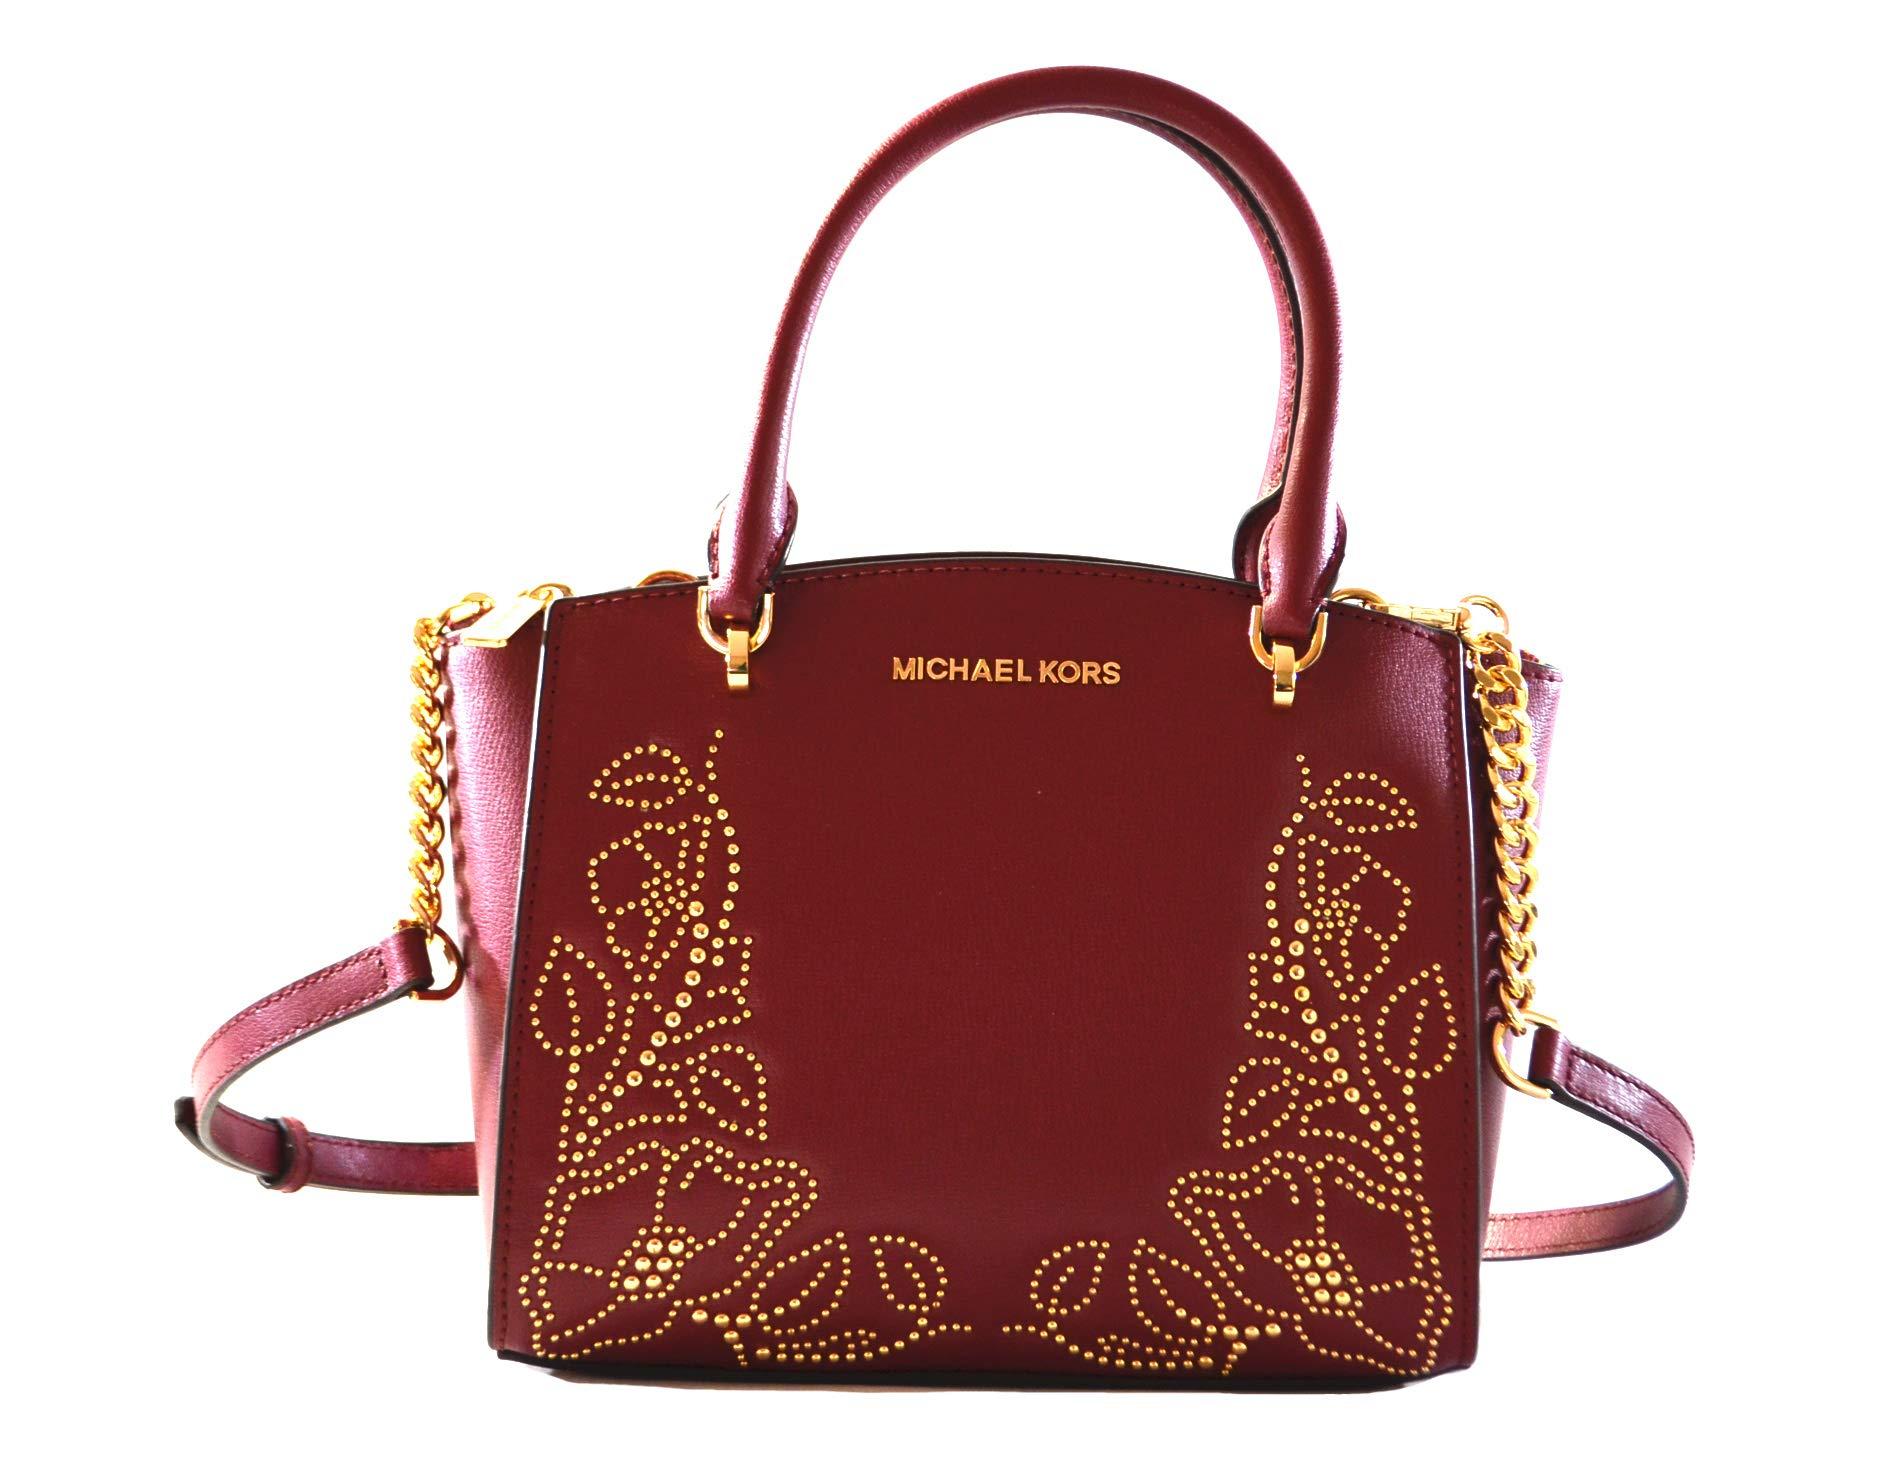 Michael Kors Women's Ellis Small Convertible Leather Gold Toned Studs Satchel Crossbody Bag Purse Handbag (Mulberry)